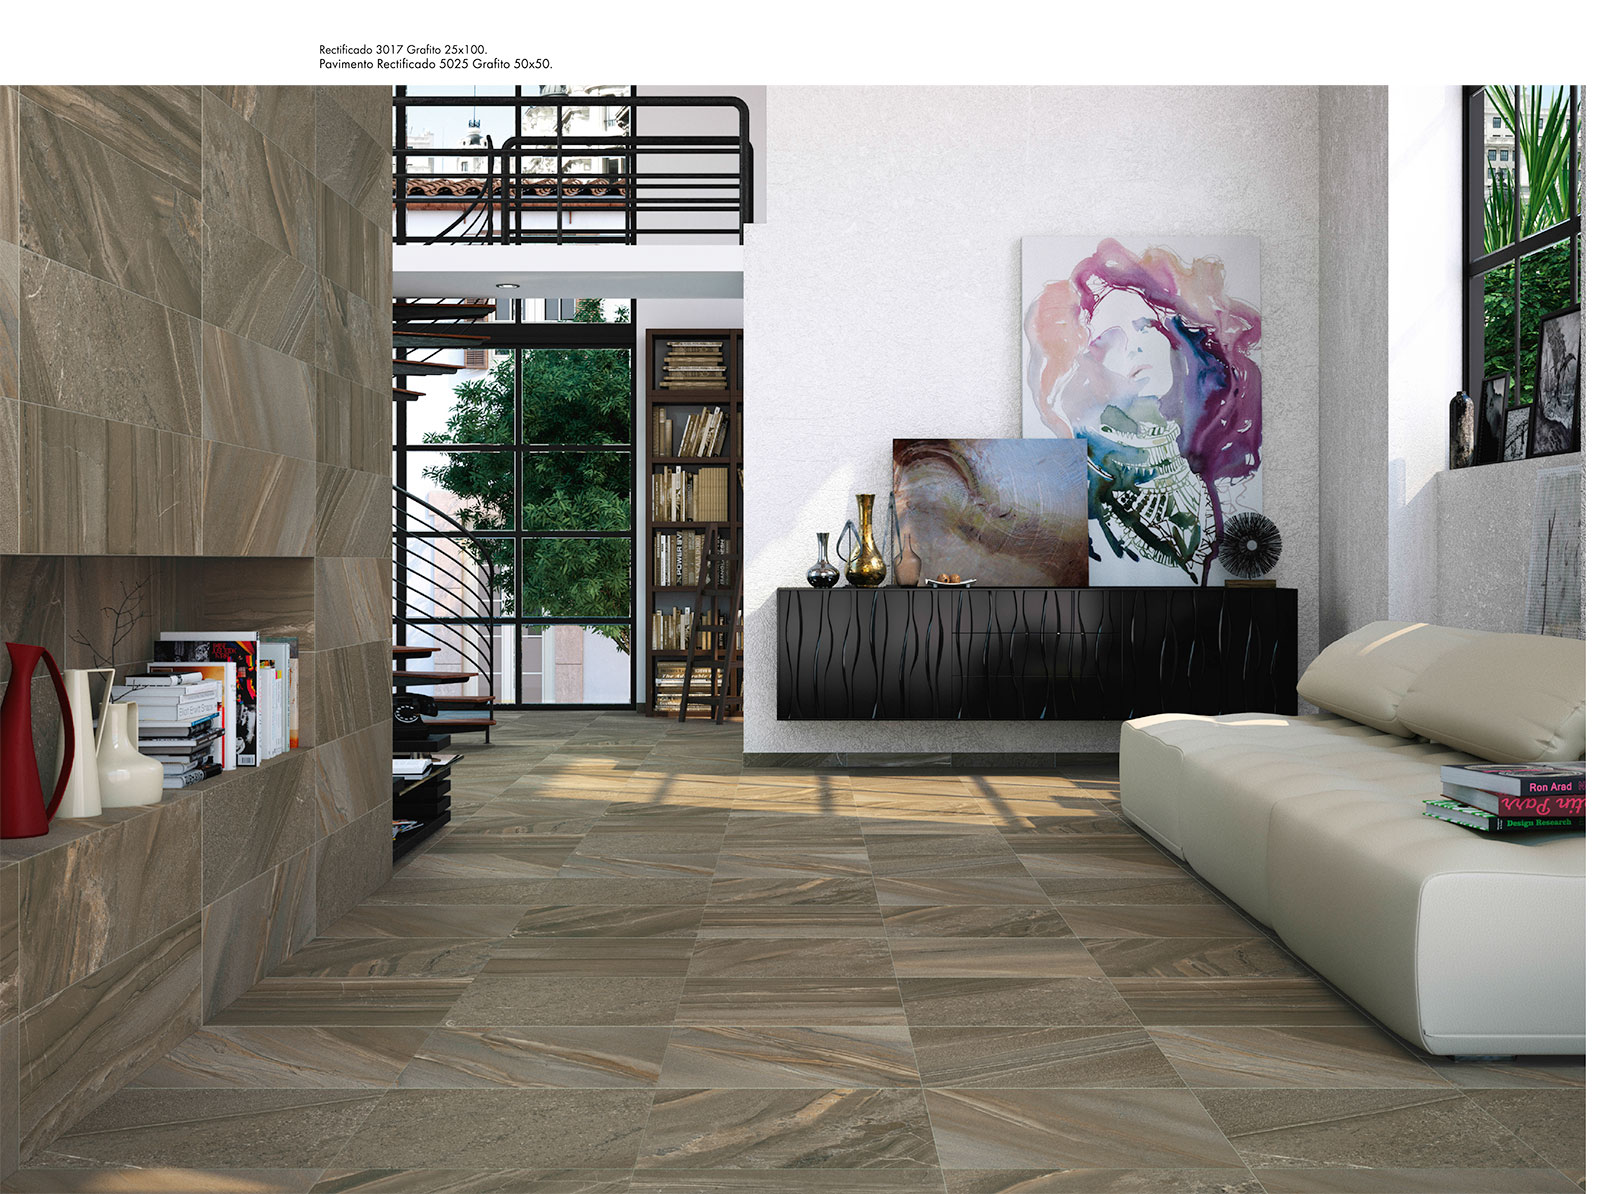 Serie 50x50 5025 azulejos y pavimentos mart n for Azulejos y pavimentos